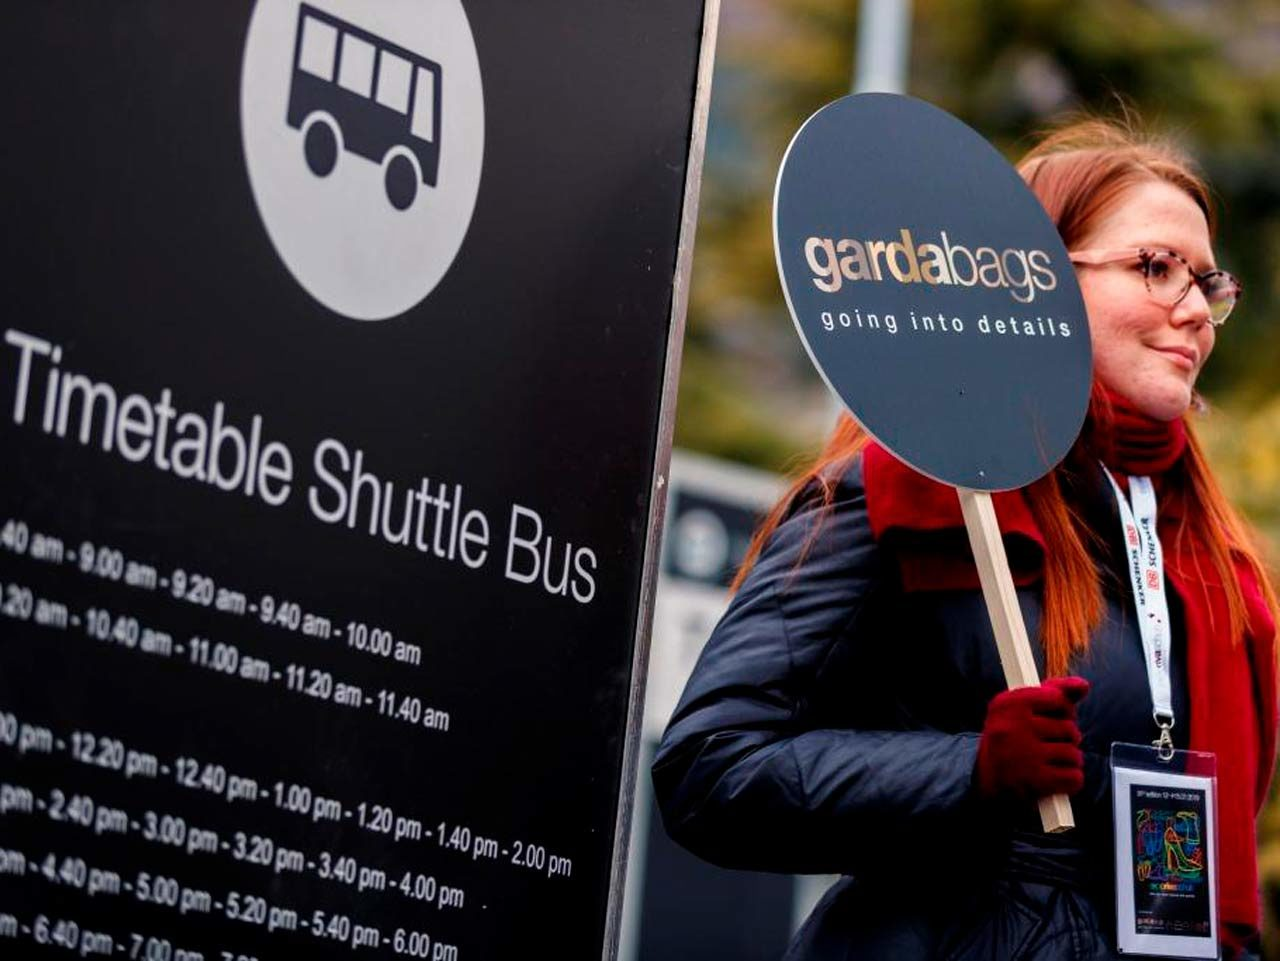 Schuttle bus entre les salons Gardabags et Expo Riva Schuh